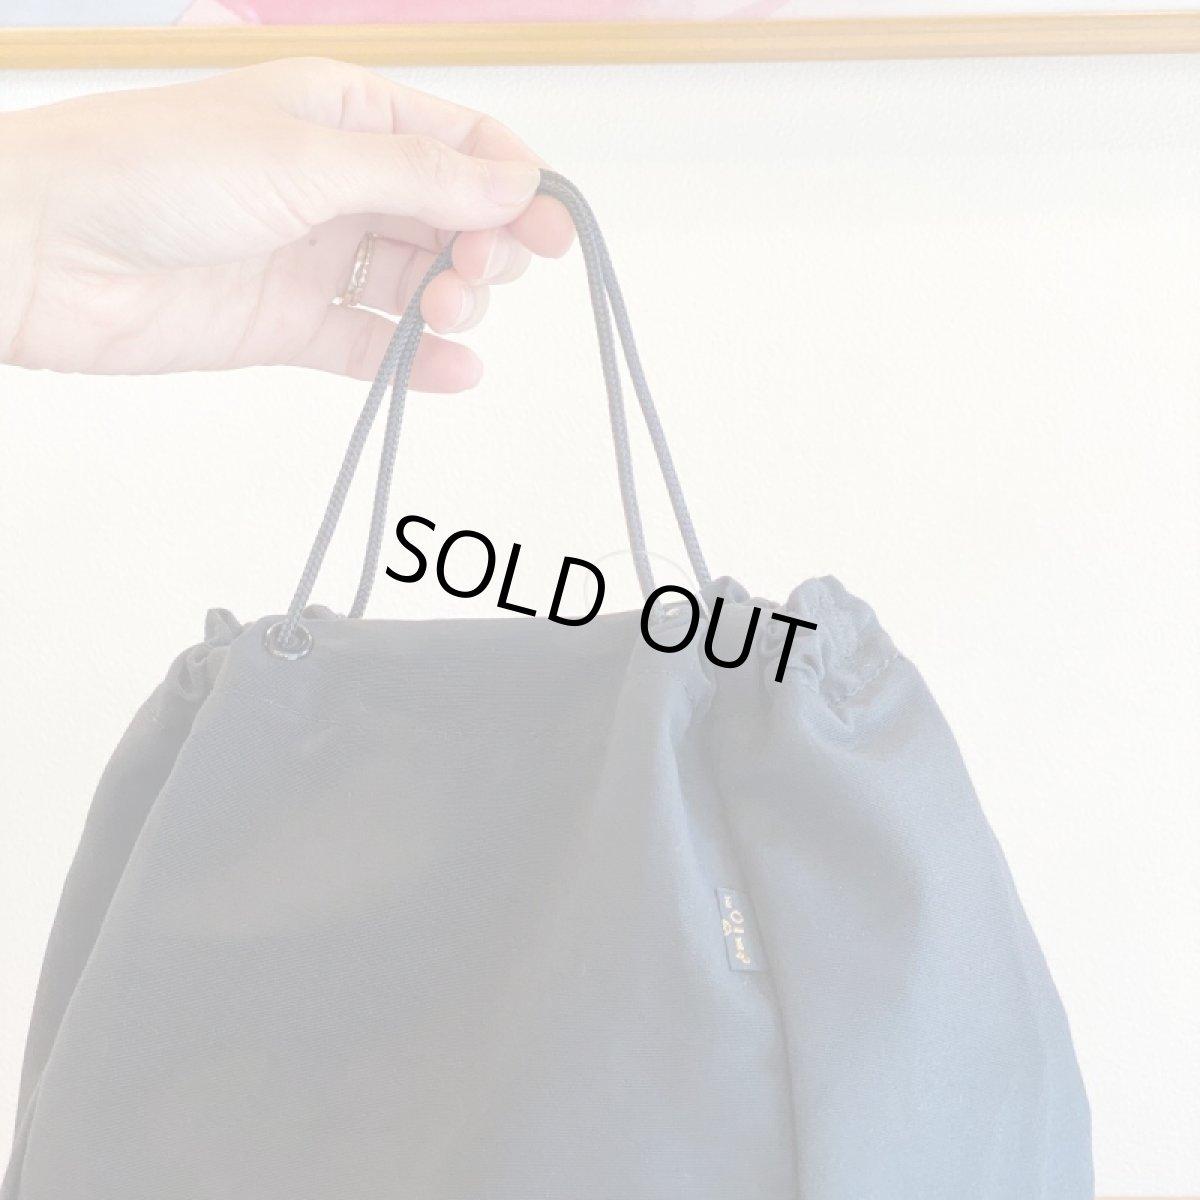 画像1: 【3色展開】BAG'n'NOUN BLACK SPINDLE (1)